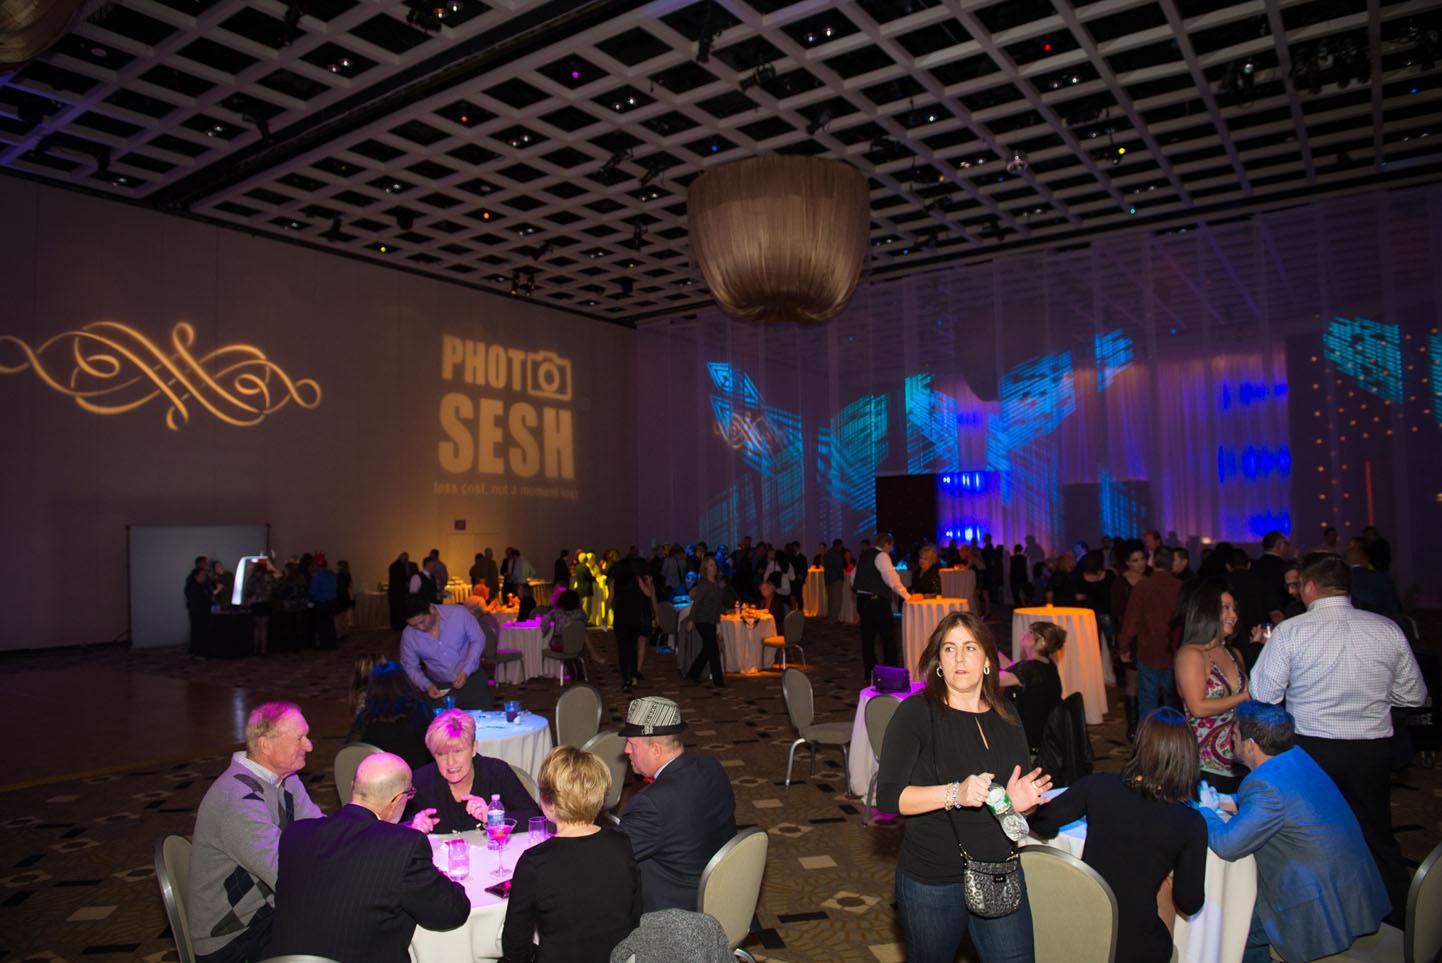 2015-12-09 ReMax Corpoarte Event - The Borgata - Atlantic City NJ - Photo Sesh - 2015-5061.jpg